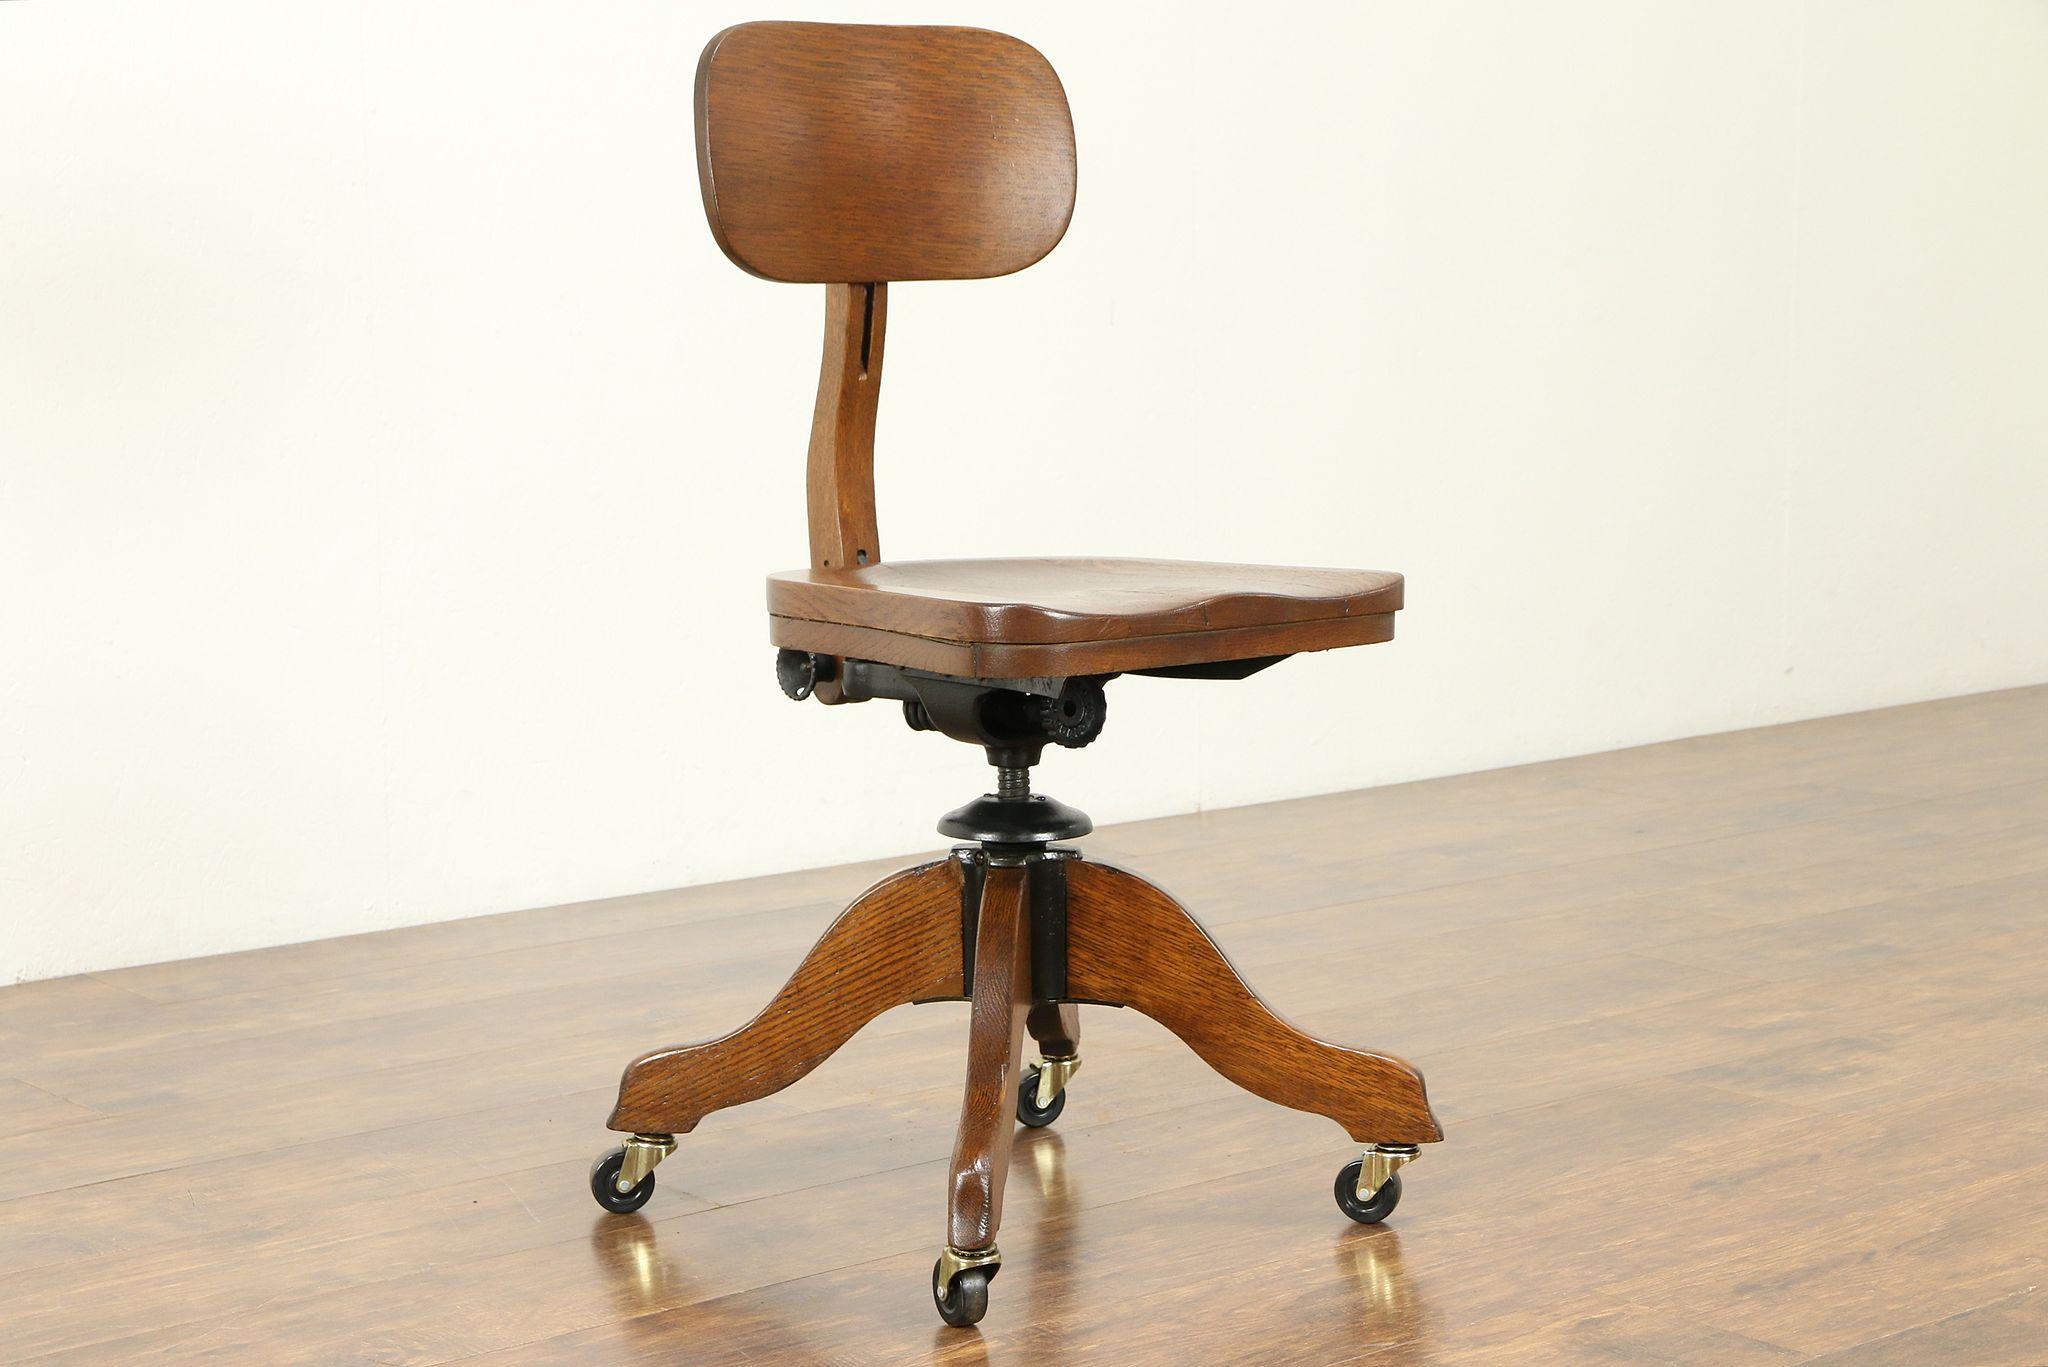 Swivel Quarter Sawn Oak 1925 Antique Desk Chair Adjustable Johnson 30955